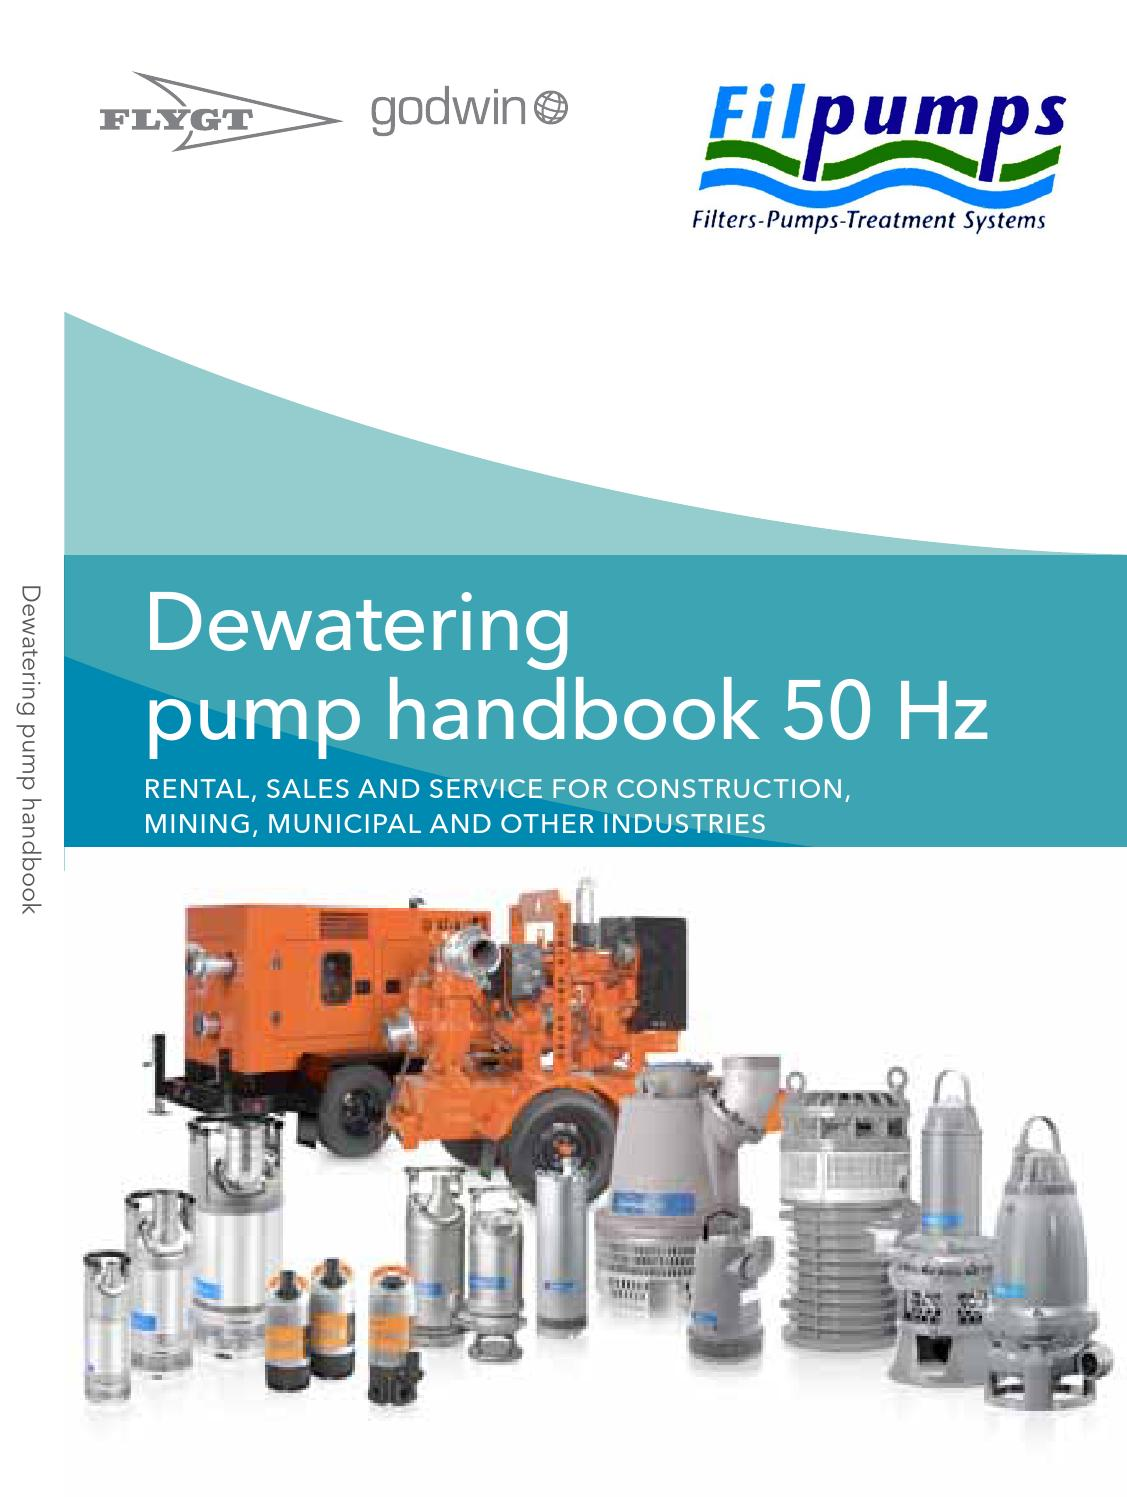 Fps dewatering handbook by Filpumps Ltd - issuu